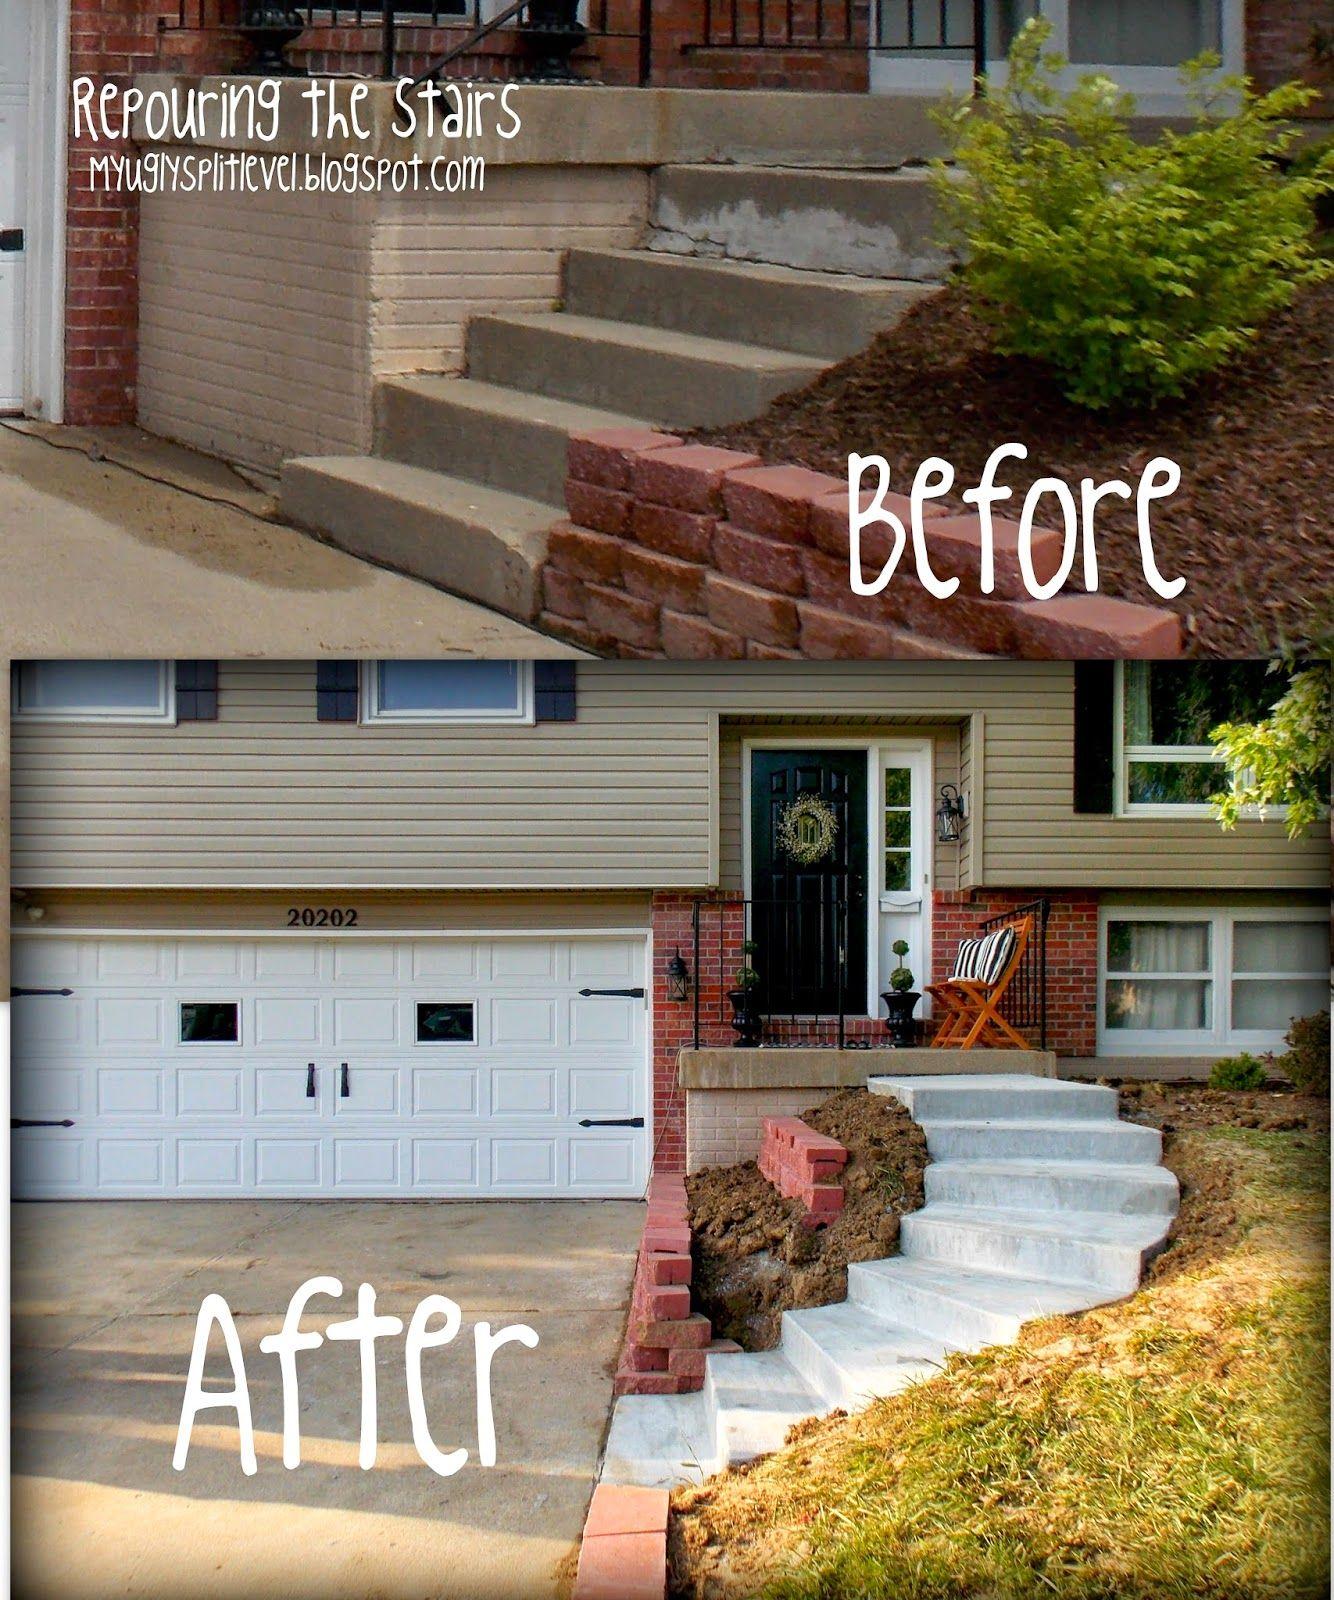 10 Awesome Landscaping Ideas For Split Level Homes split level front steps remodel my ugly split level angie front 2020